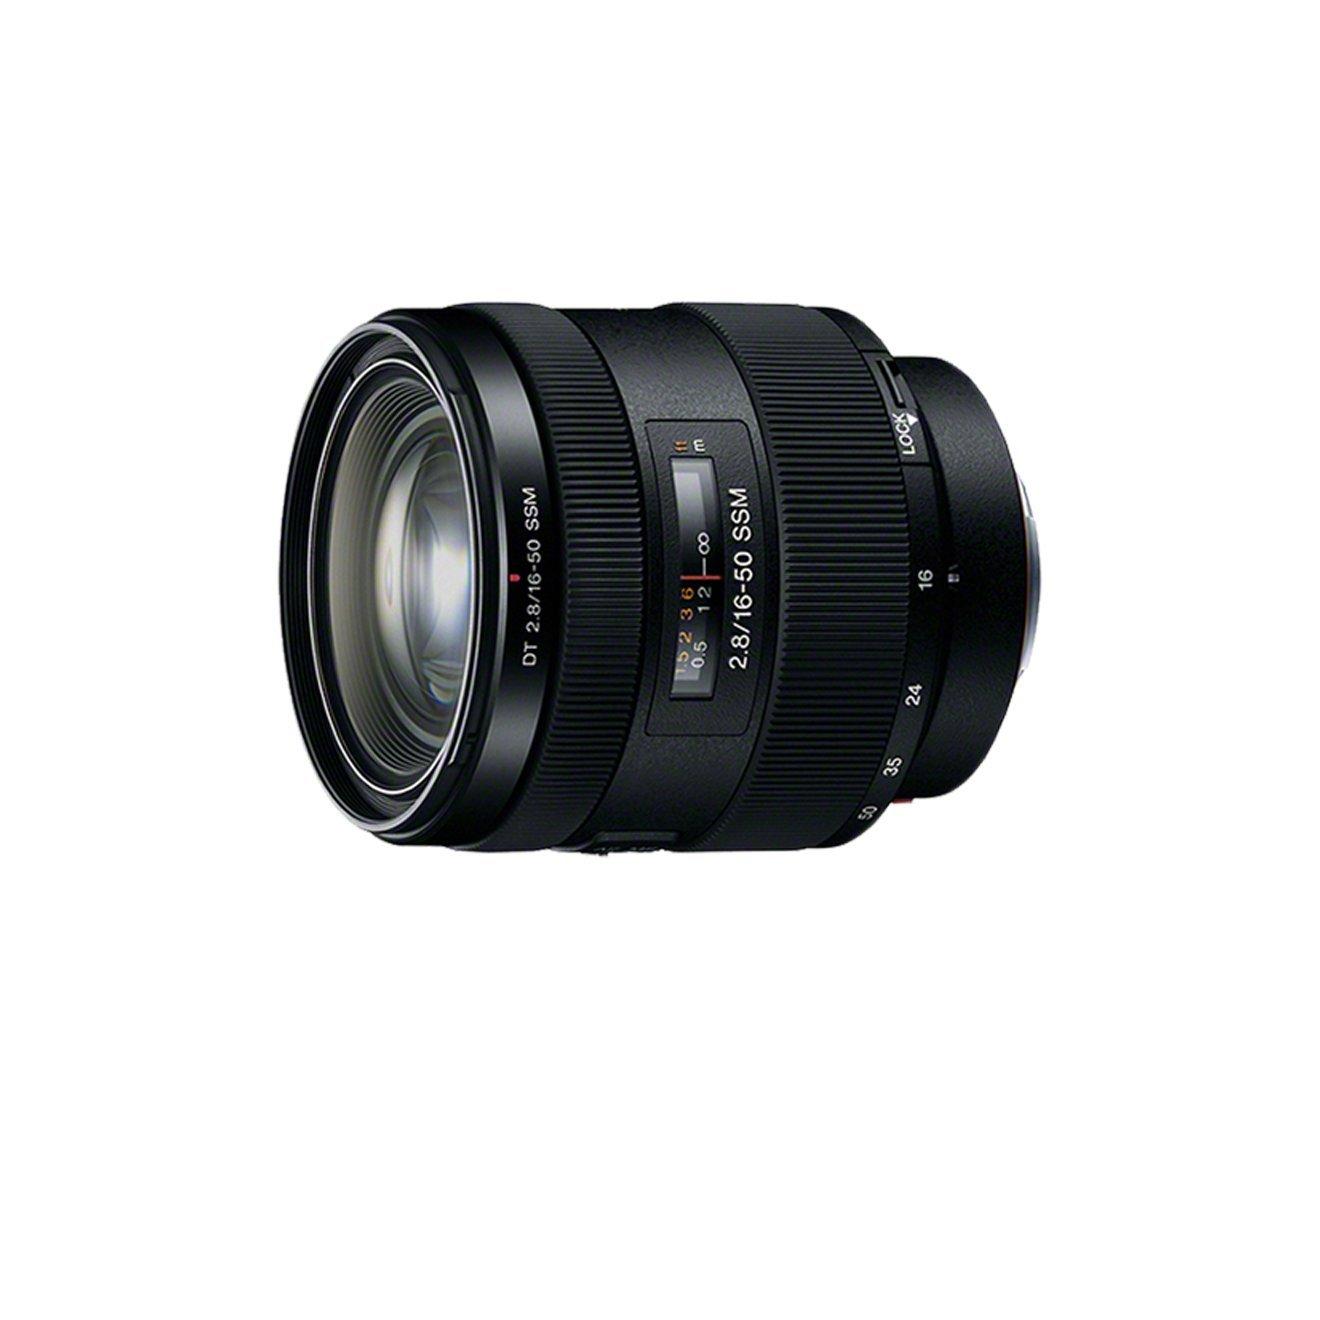 Sony SAL Objetivo para Sony distancia focal mm apertura f  negro